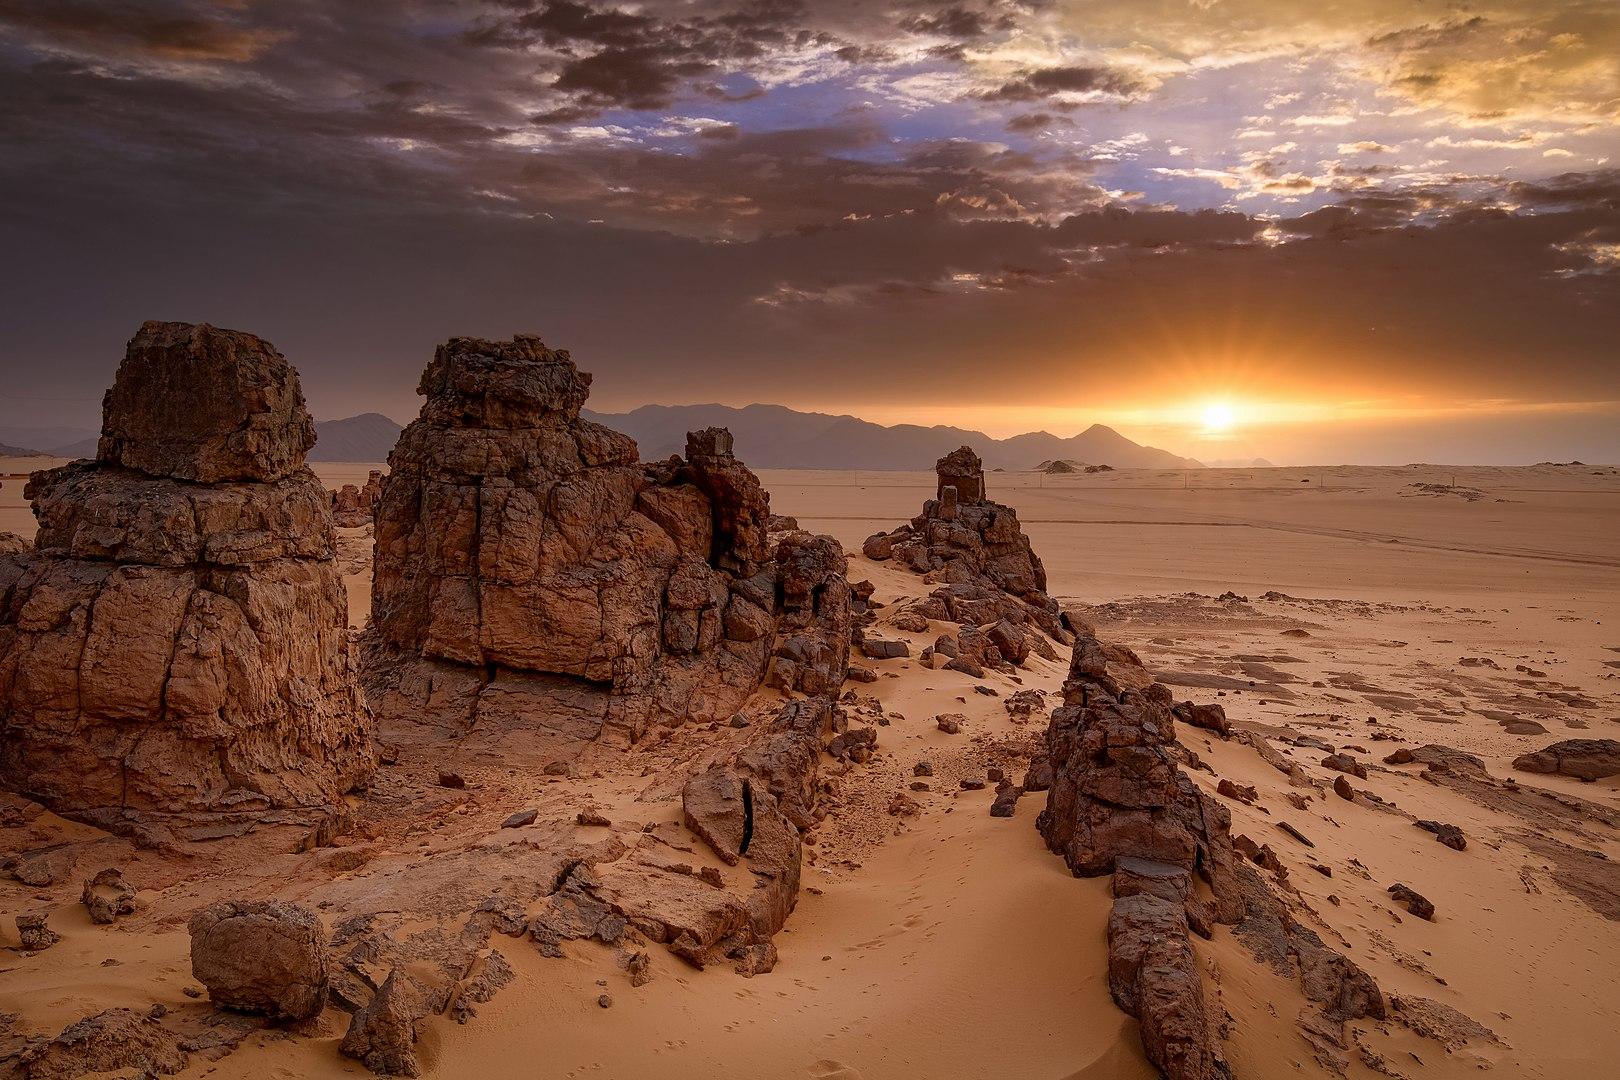 Sunrise on the Tassili n'Ajjer Plateau